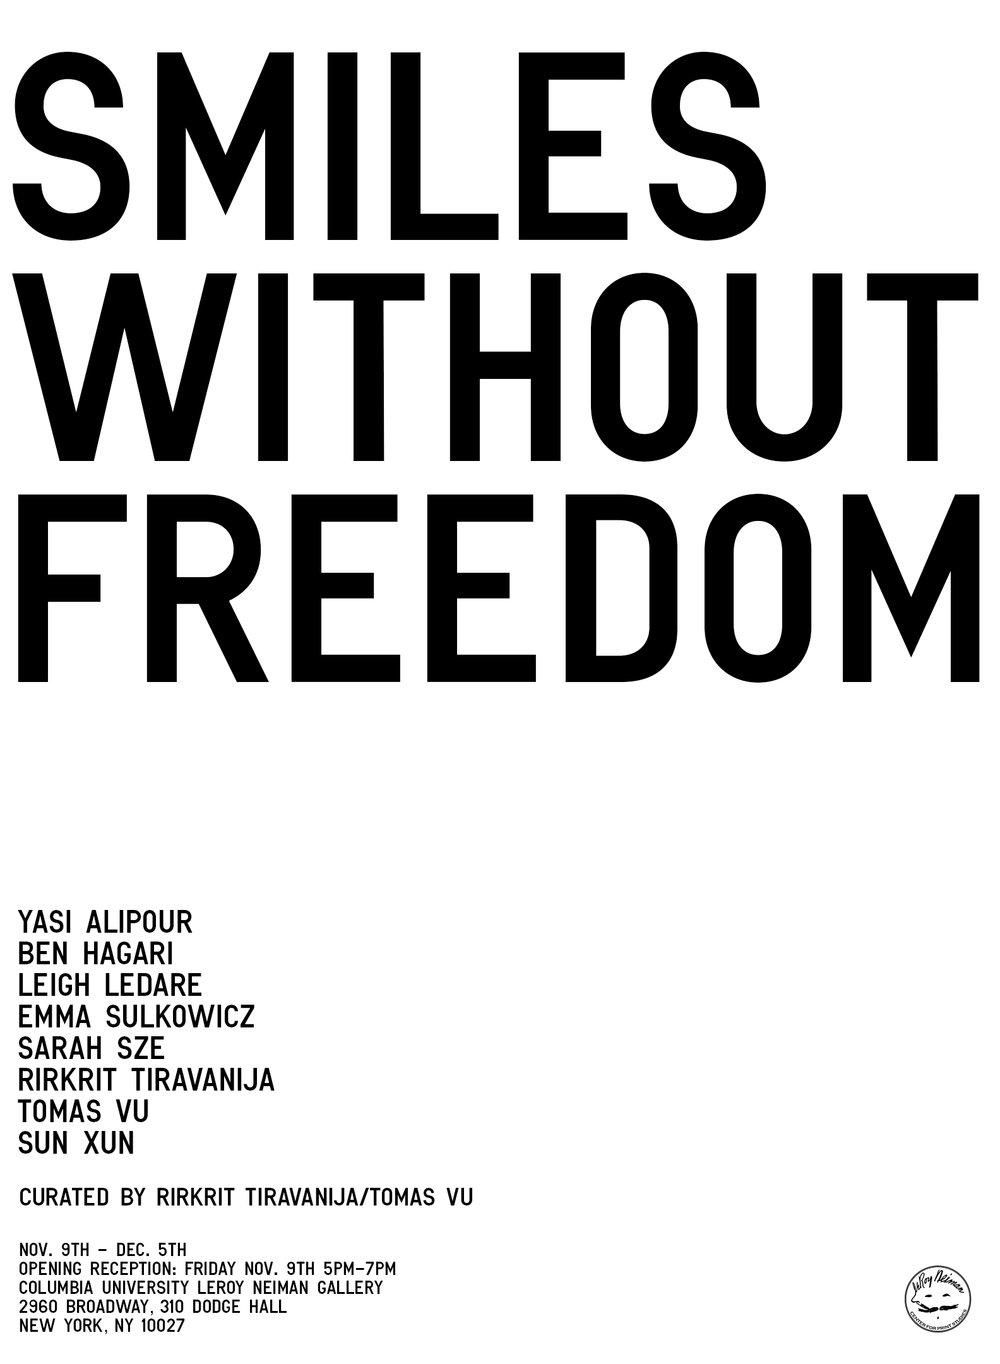 smileswithoutfreecom.jpg